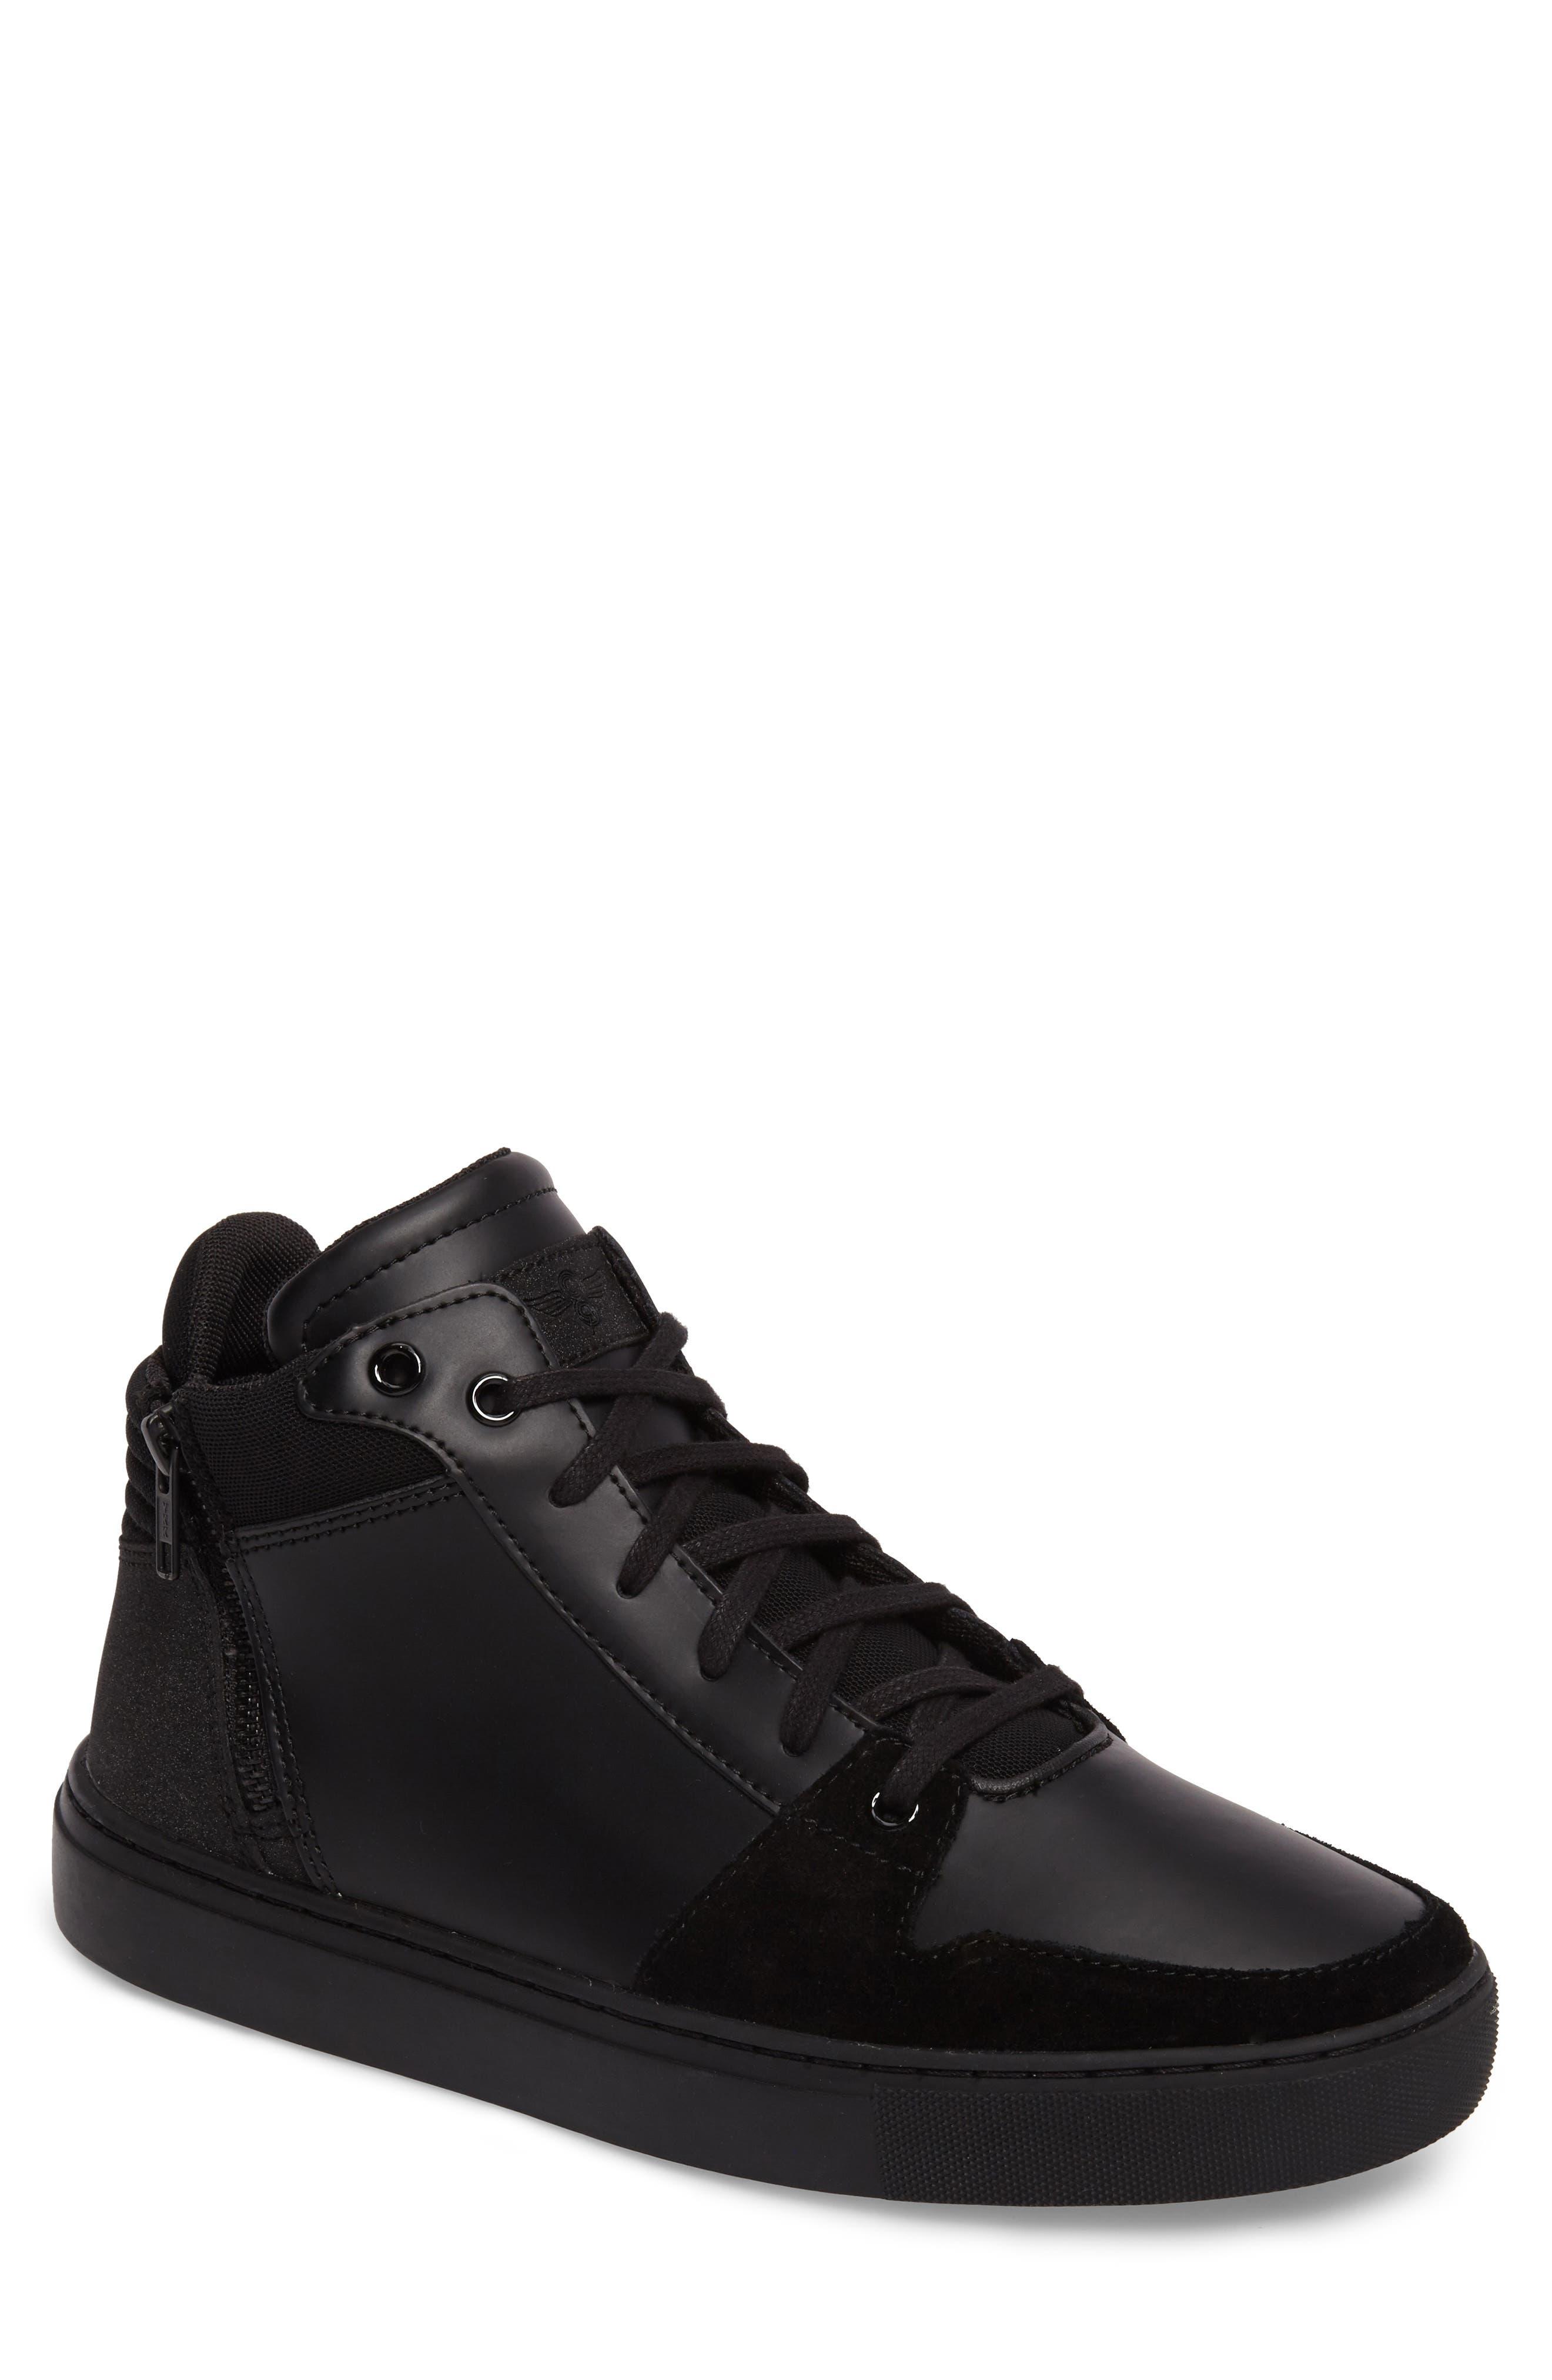 Modena Sneaker,                         Main,                         color,